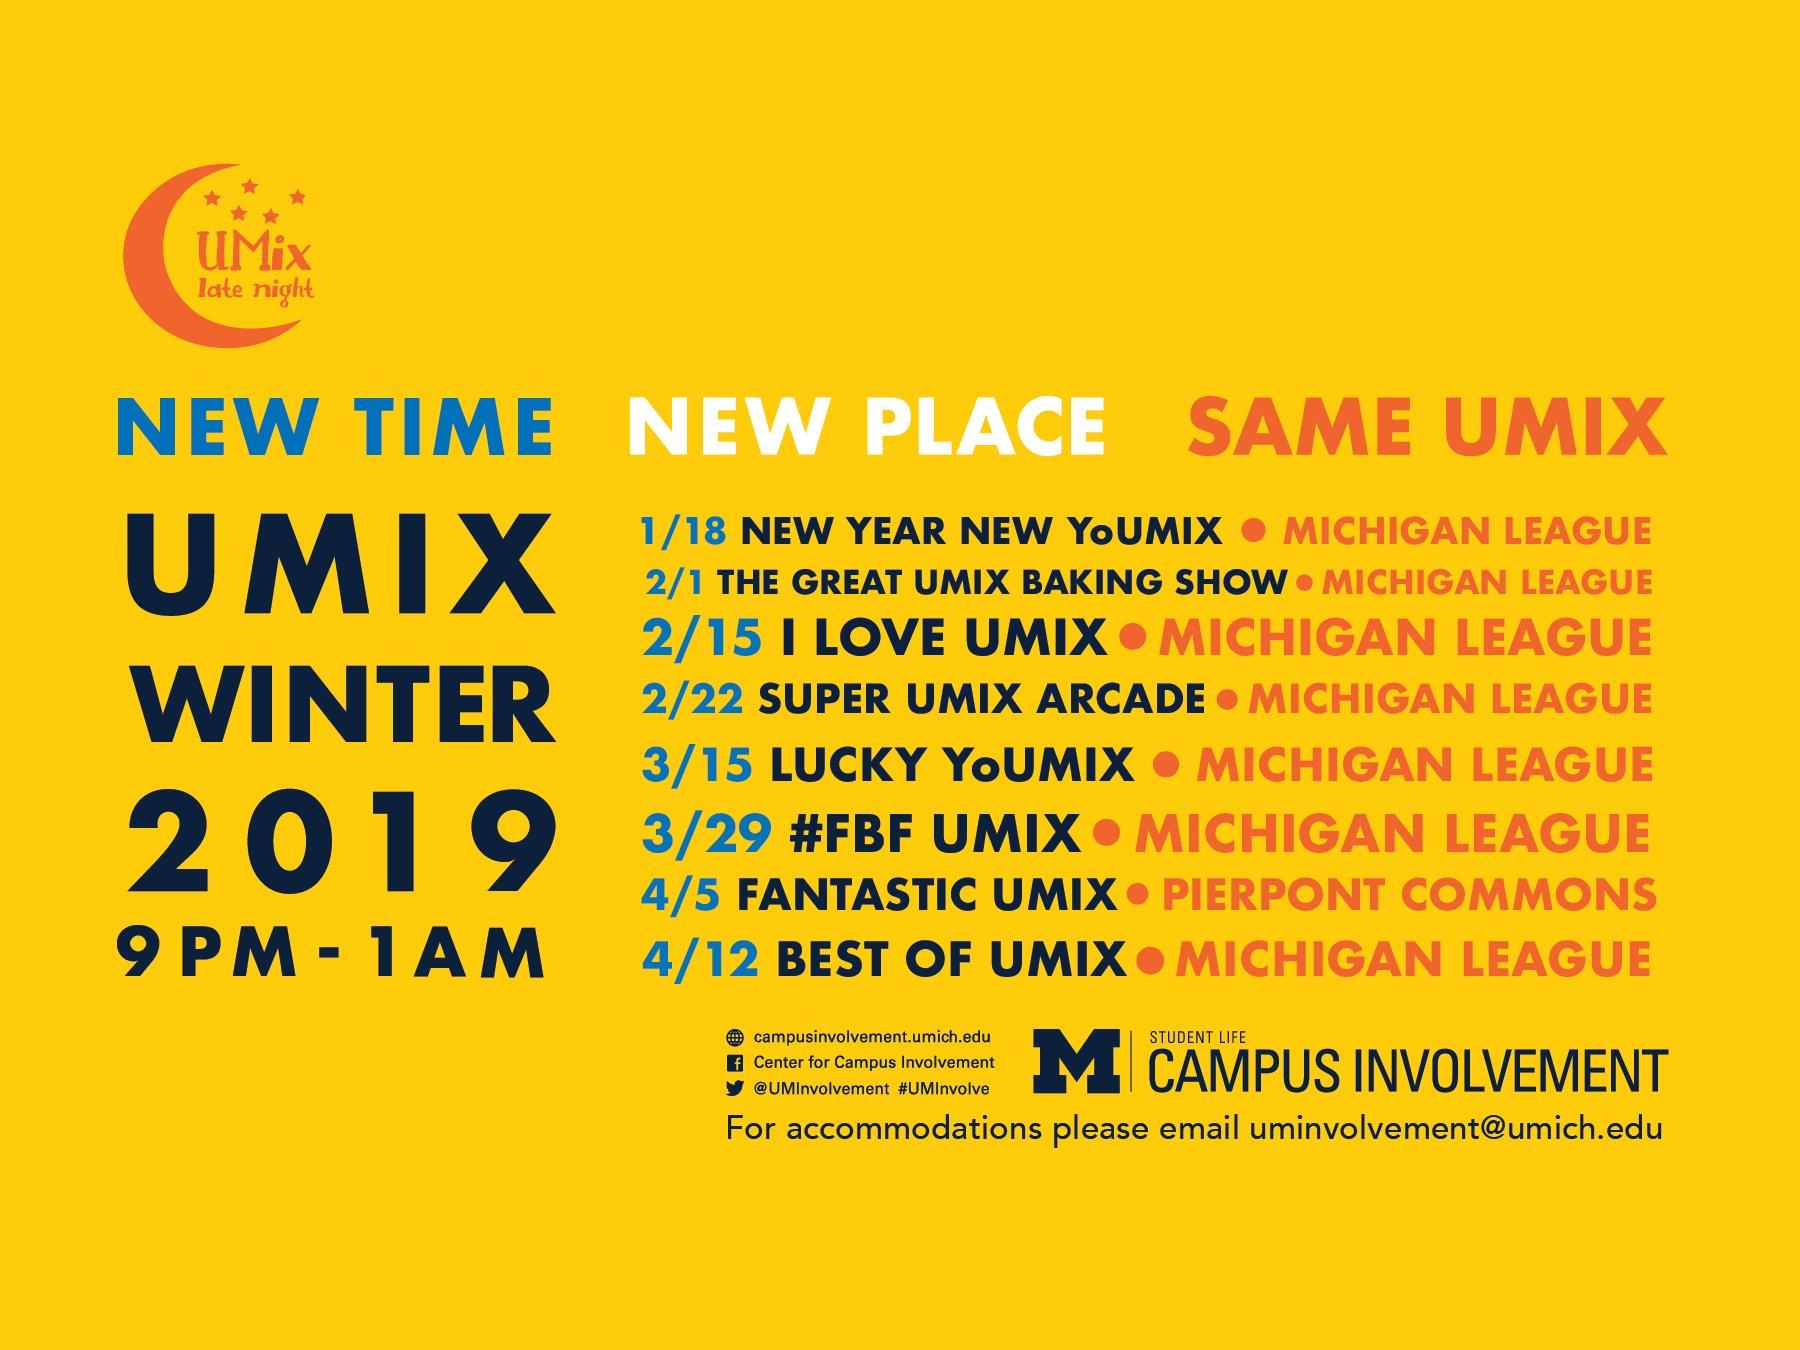 Umix Winter 2019 | Campus Involvement Calendar 2019 Umich